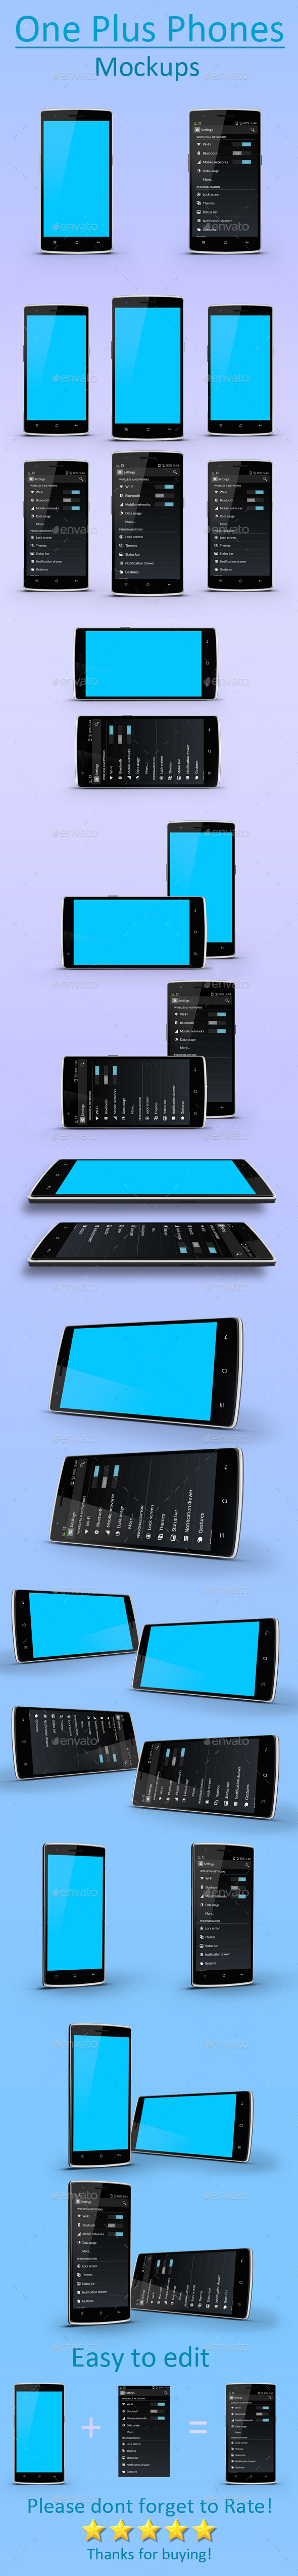 One Plus Phone Mockups - Mobile Displays